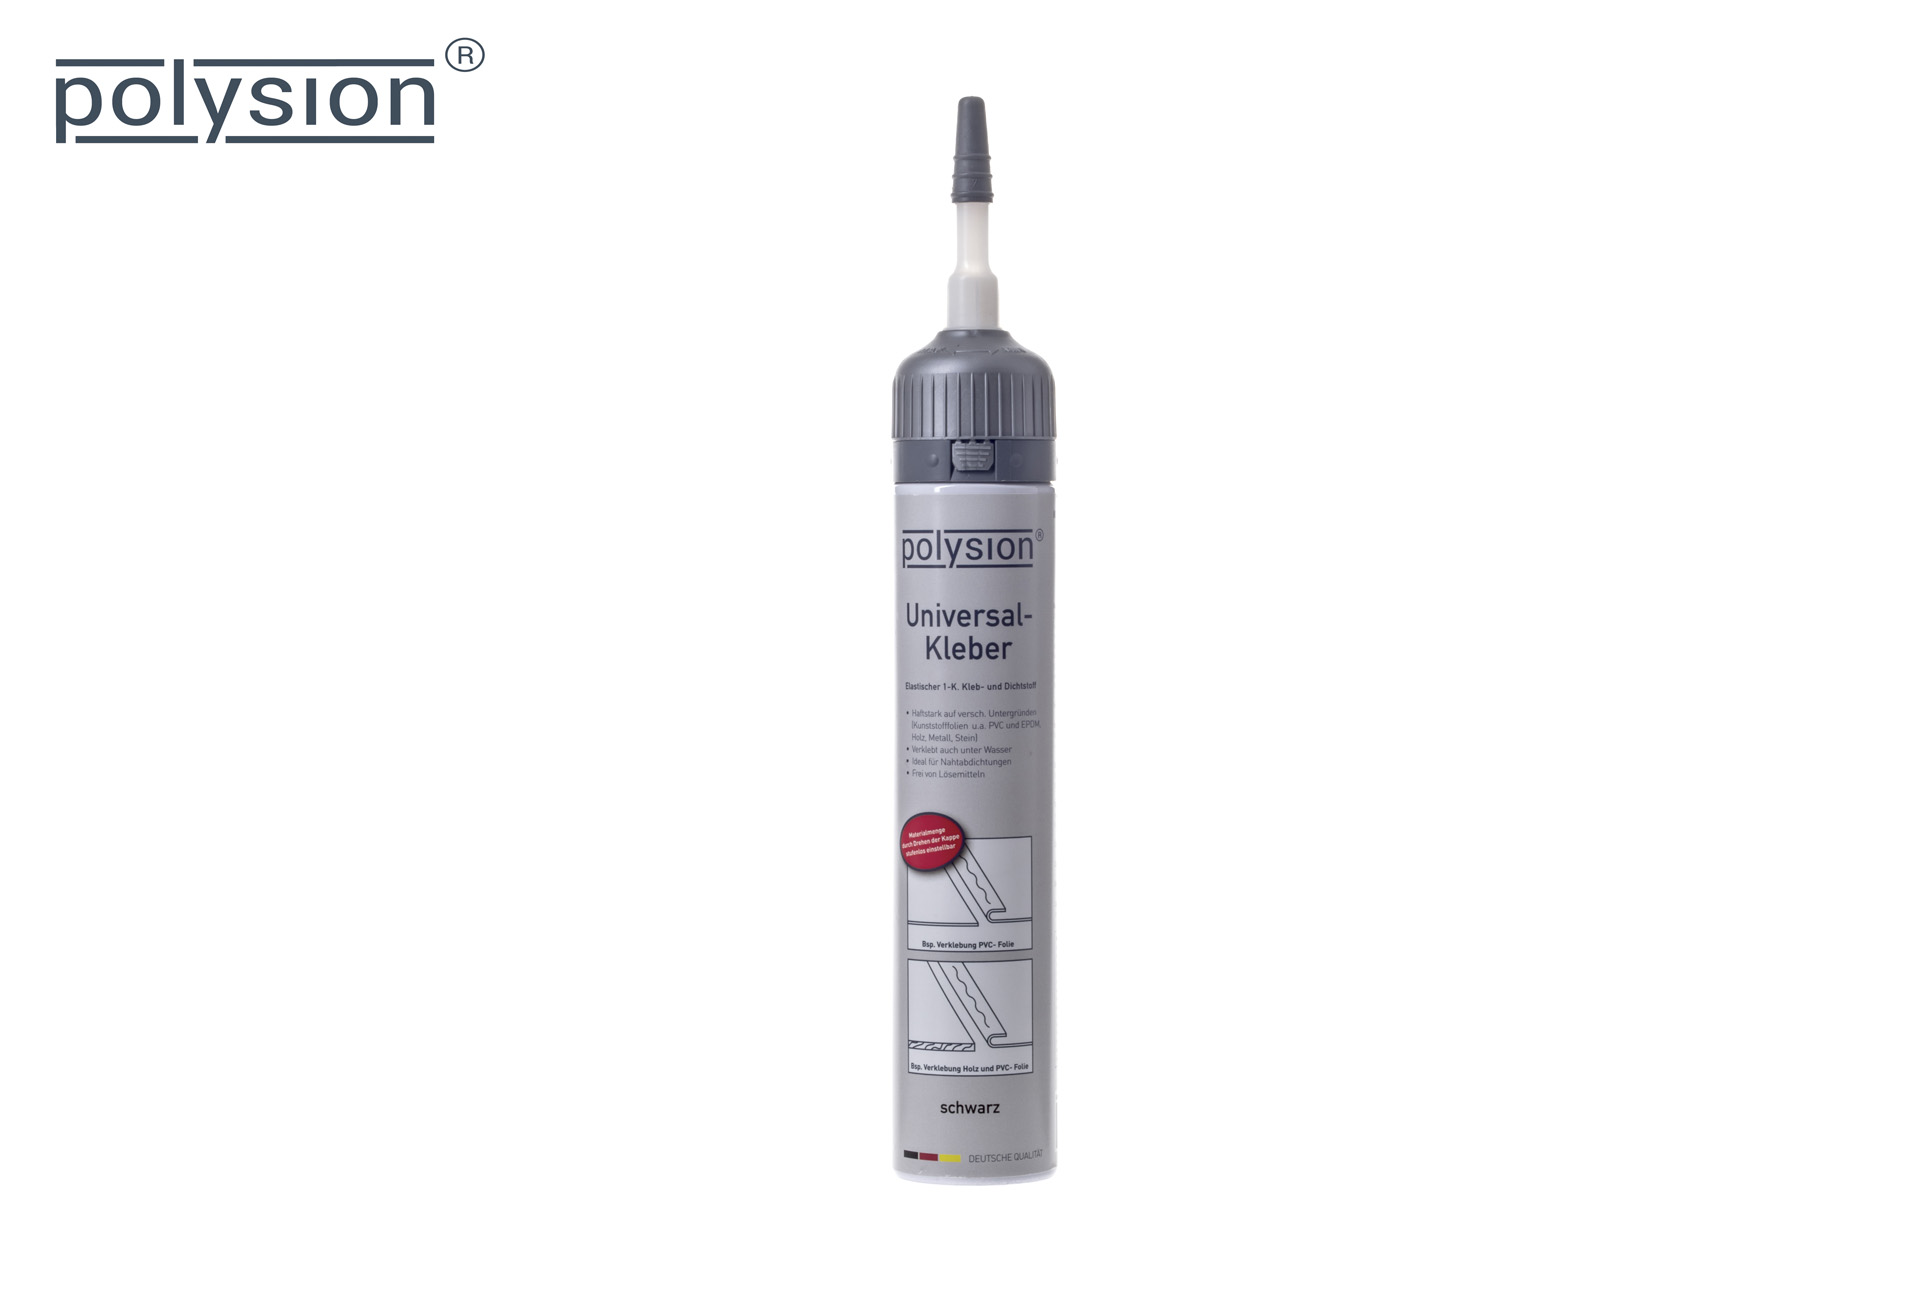 Polysion®Universalkleber, 200 ml mit Düse - Grundpreis: 9,45€/100ml